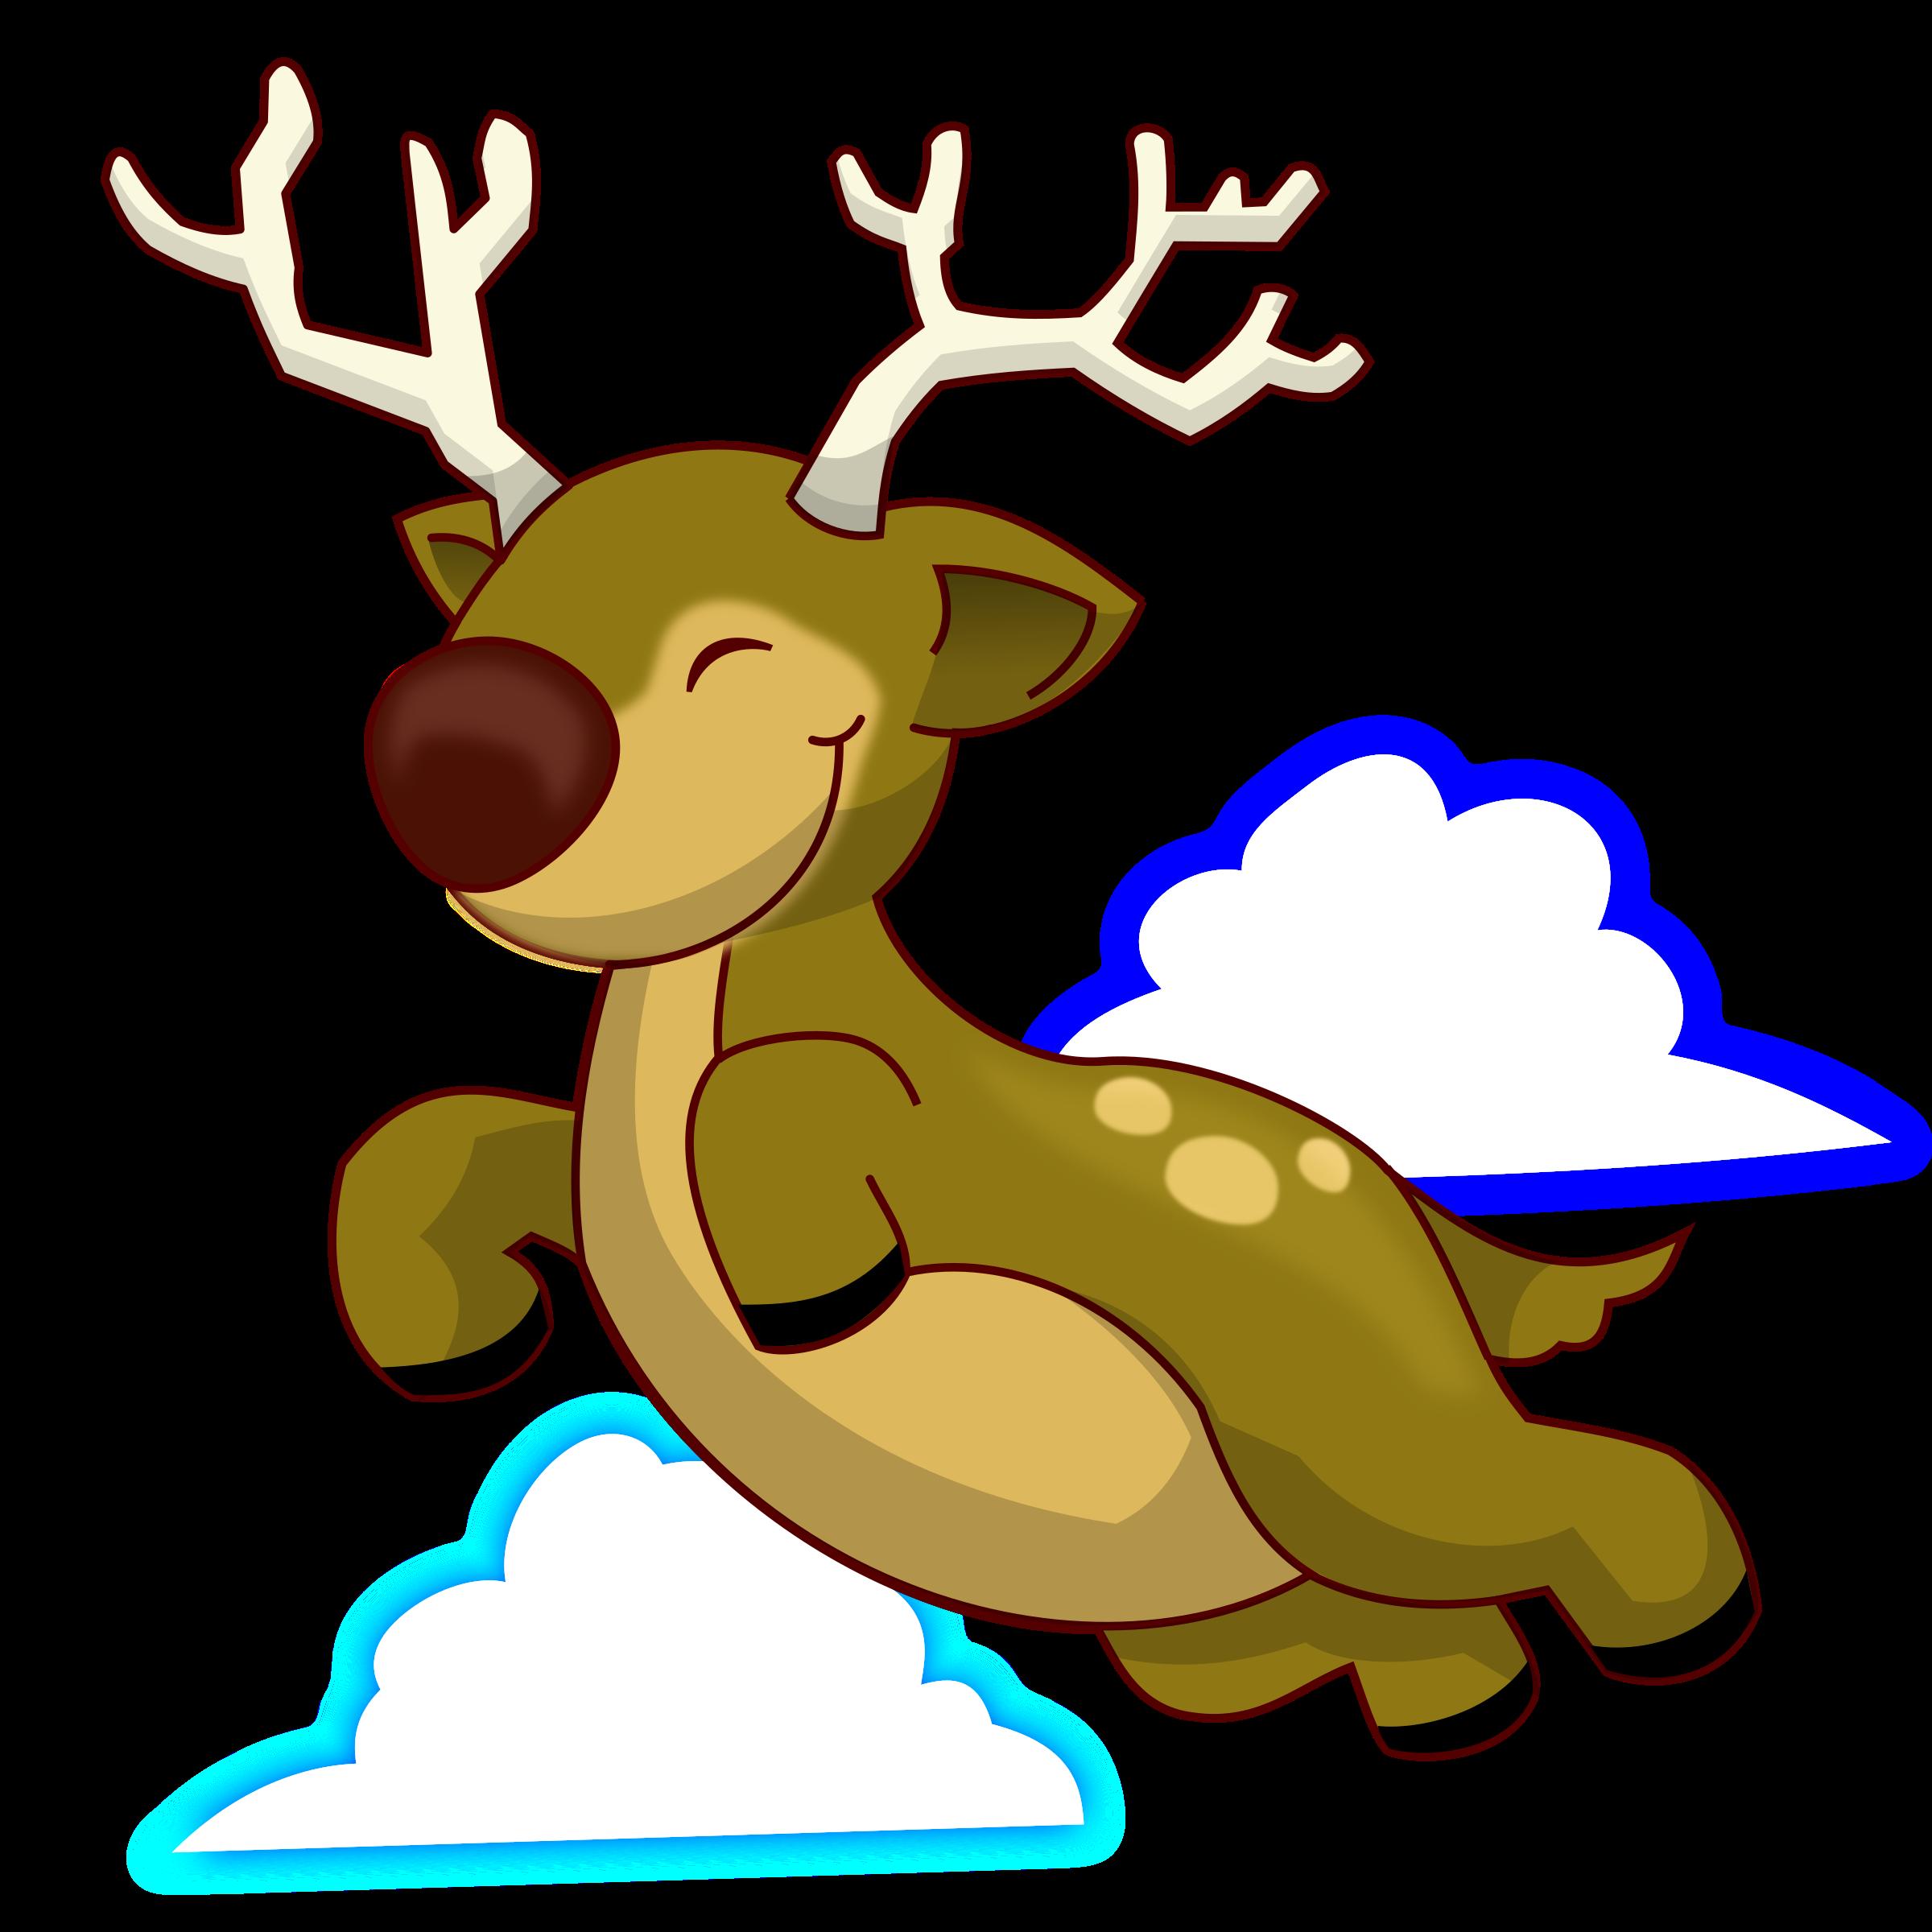 Reindeer clipart reindeer flying #5